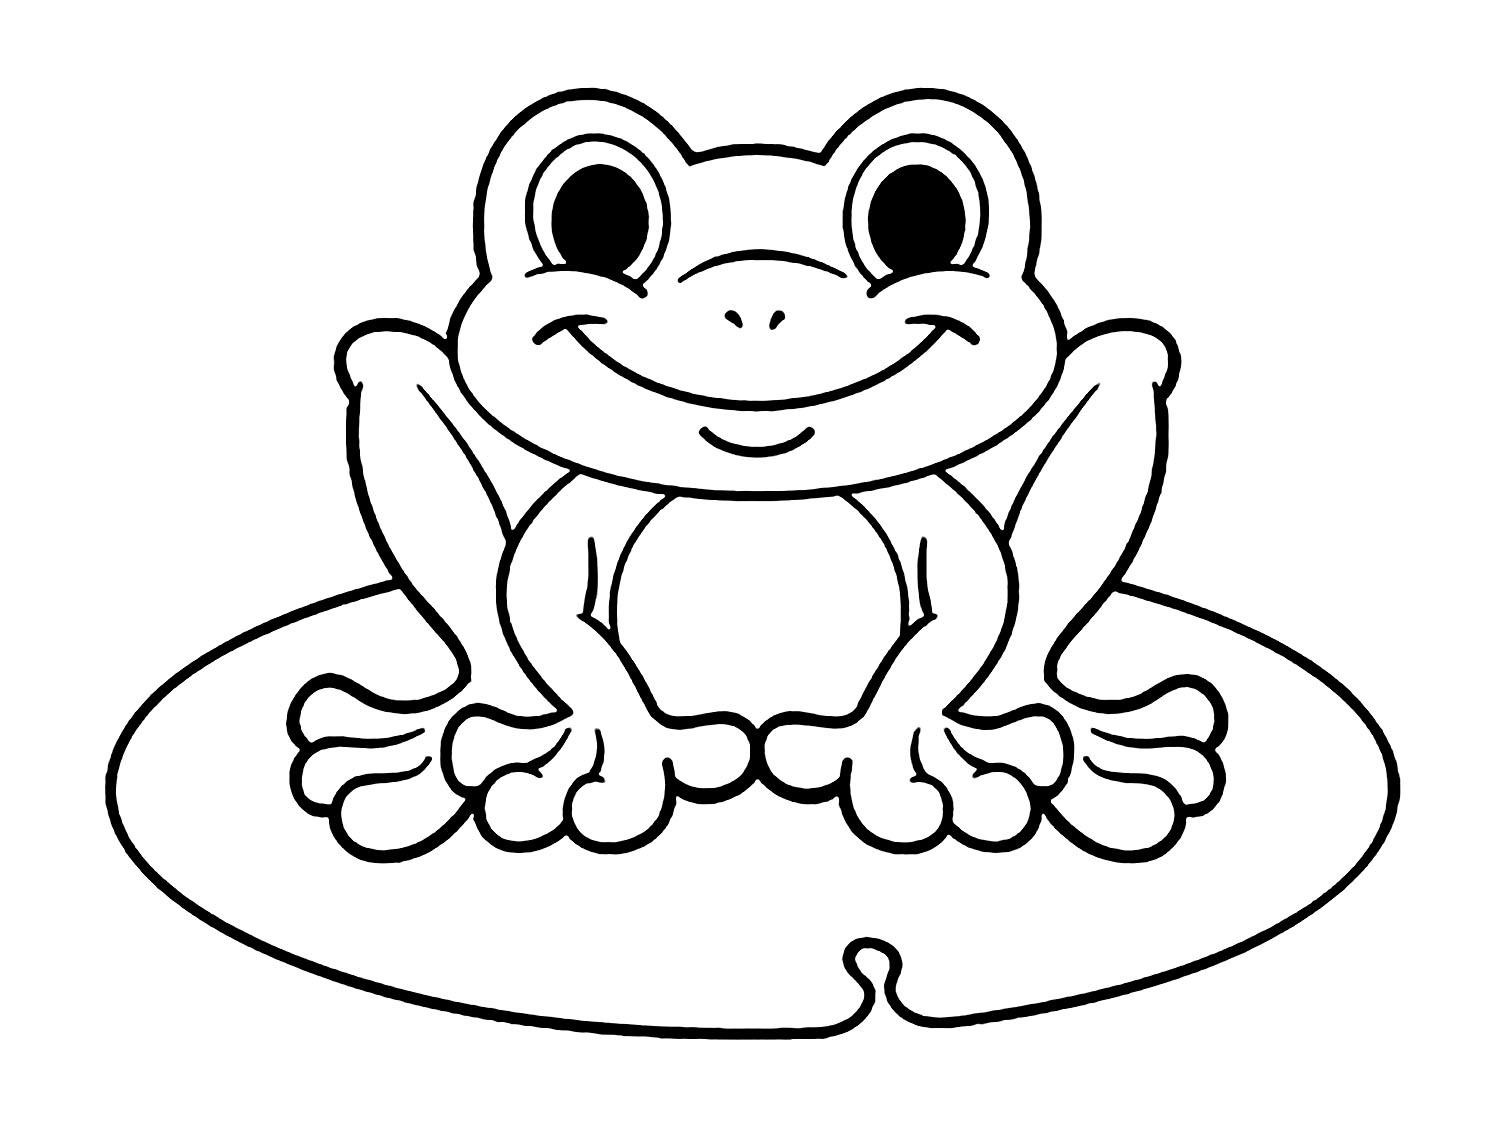 Color Worksheet Of A Tree Frog